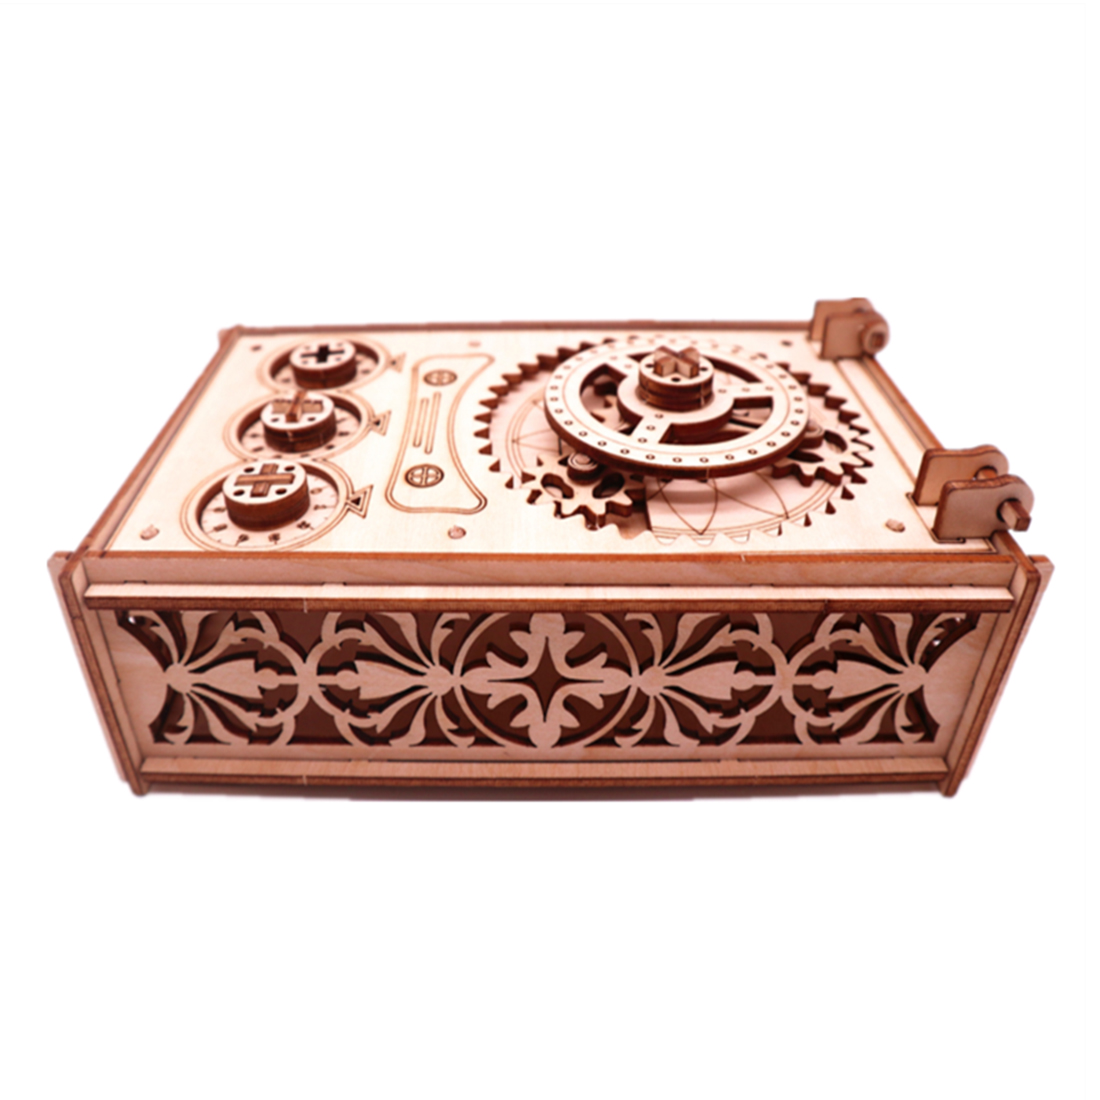 3D Organ Password Treasure Storage Box Wooden Mechanical Puzzles DIY Assembly Model Building Kits